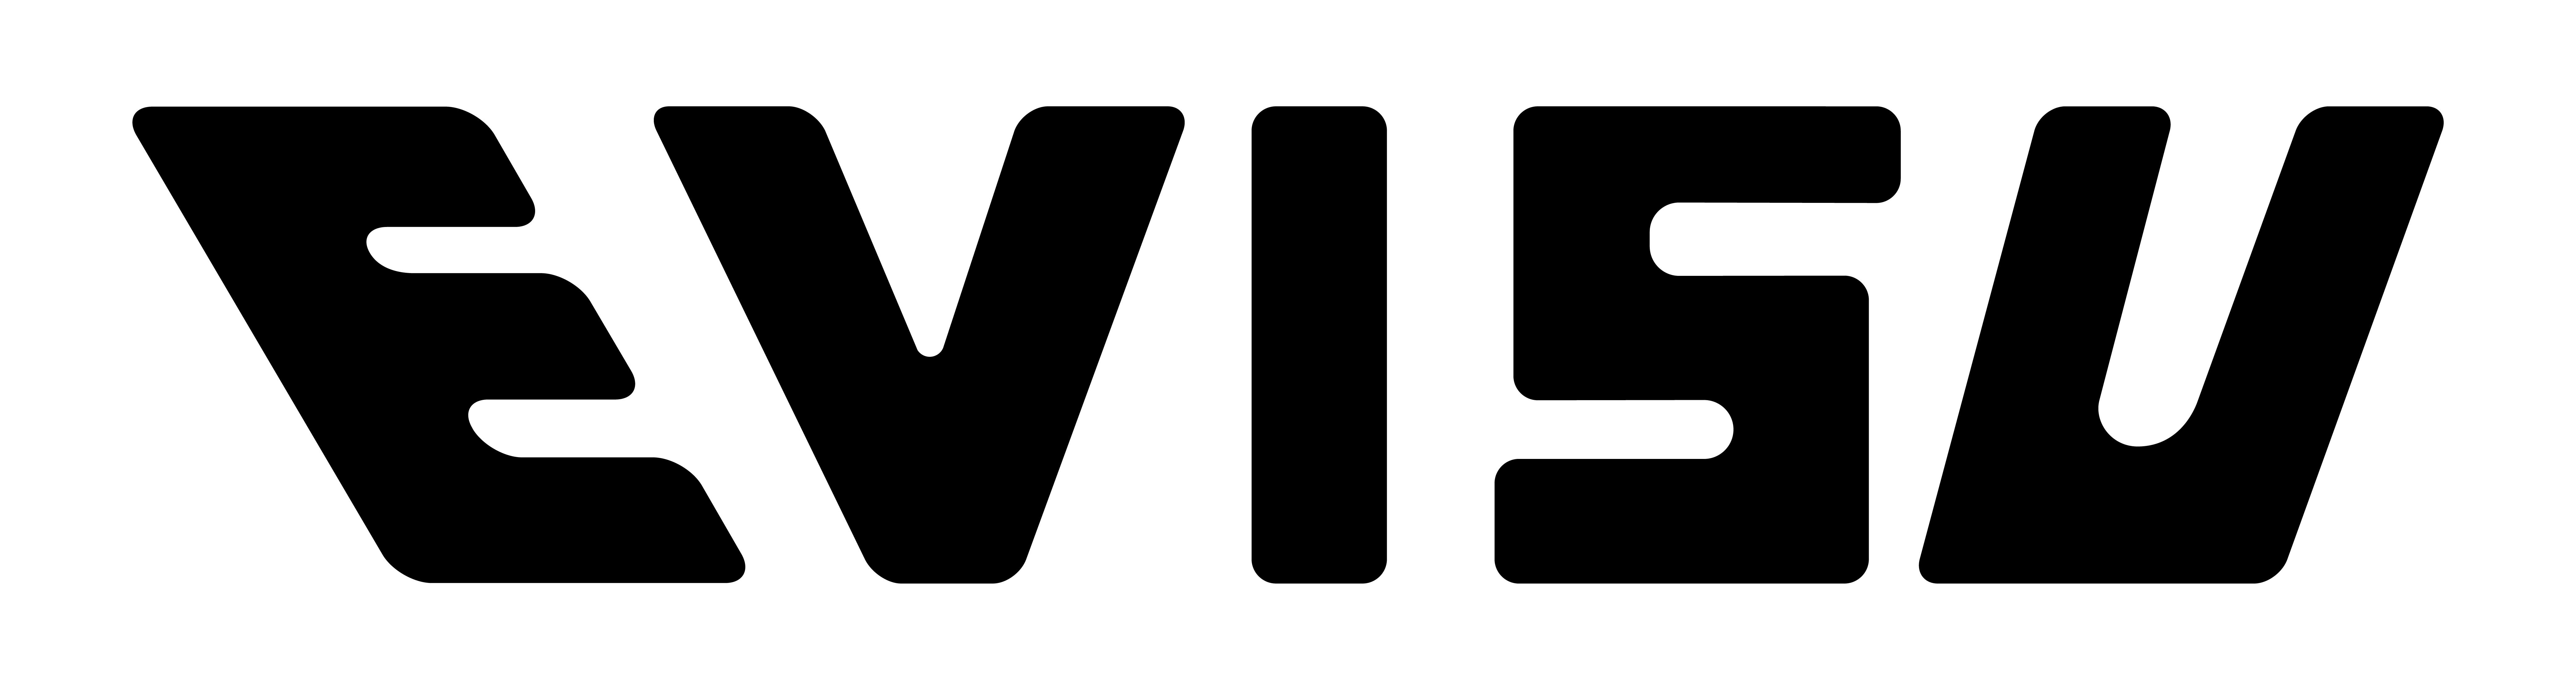 EVISU Macau Limited